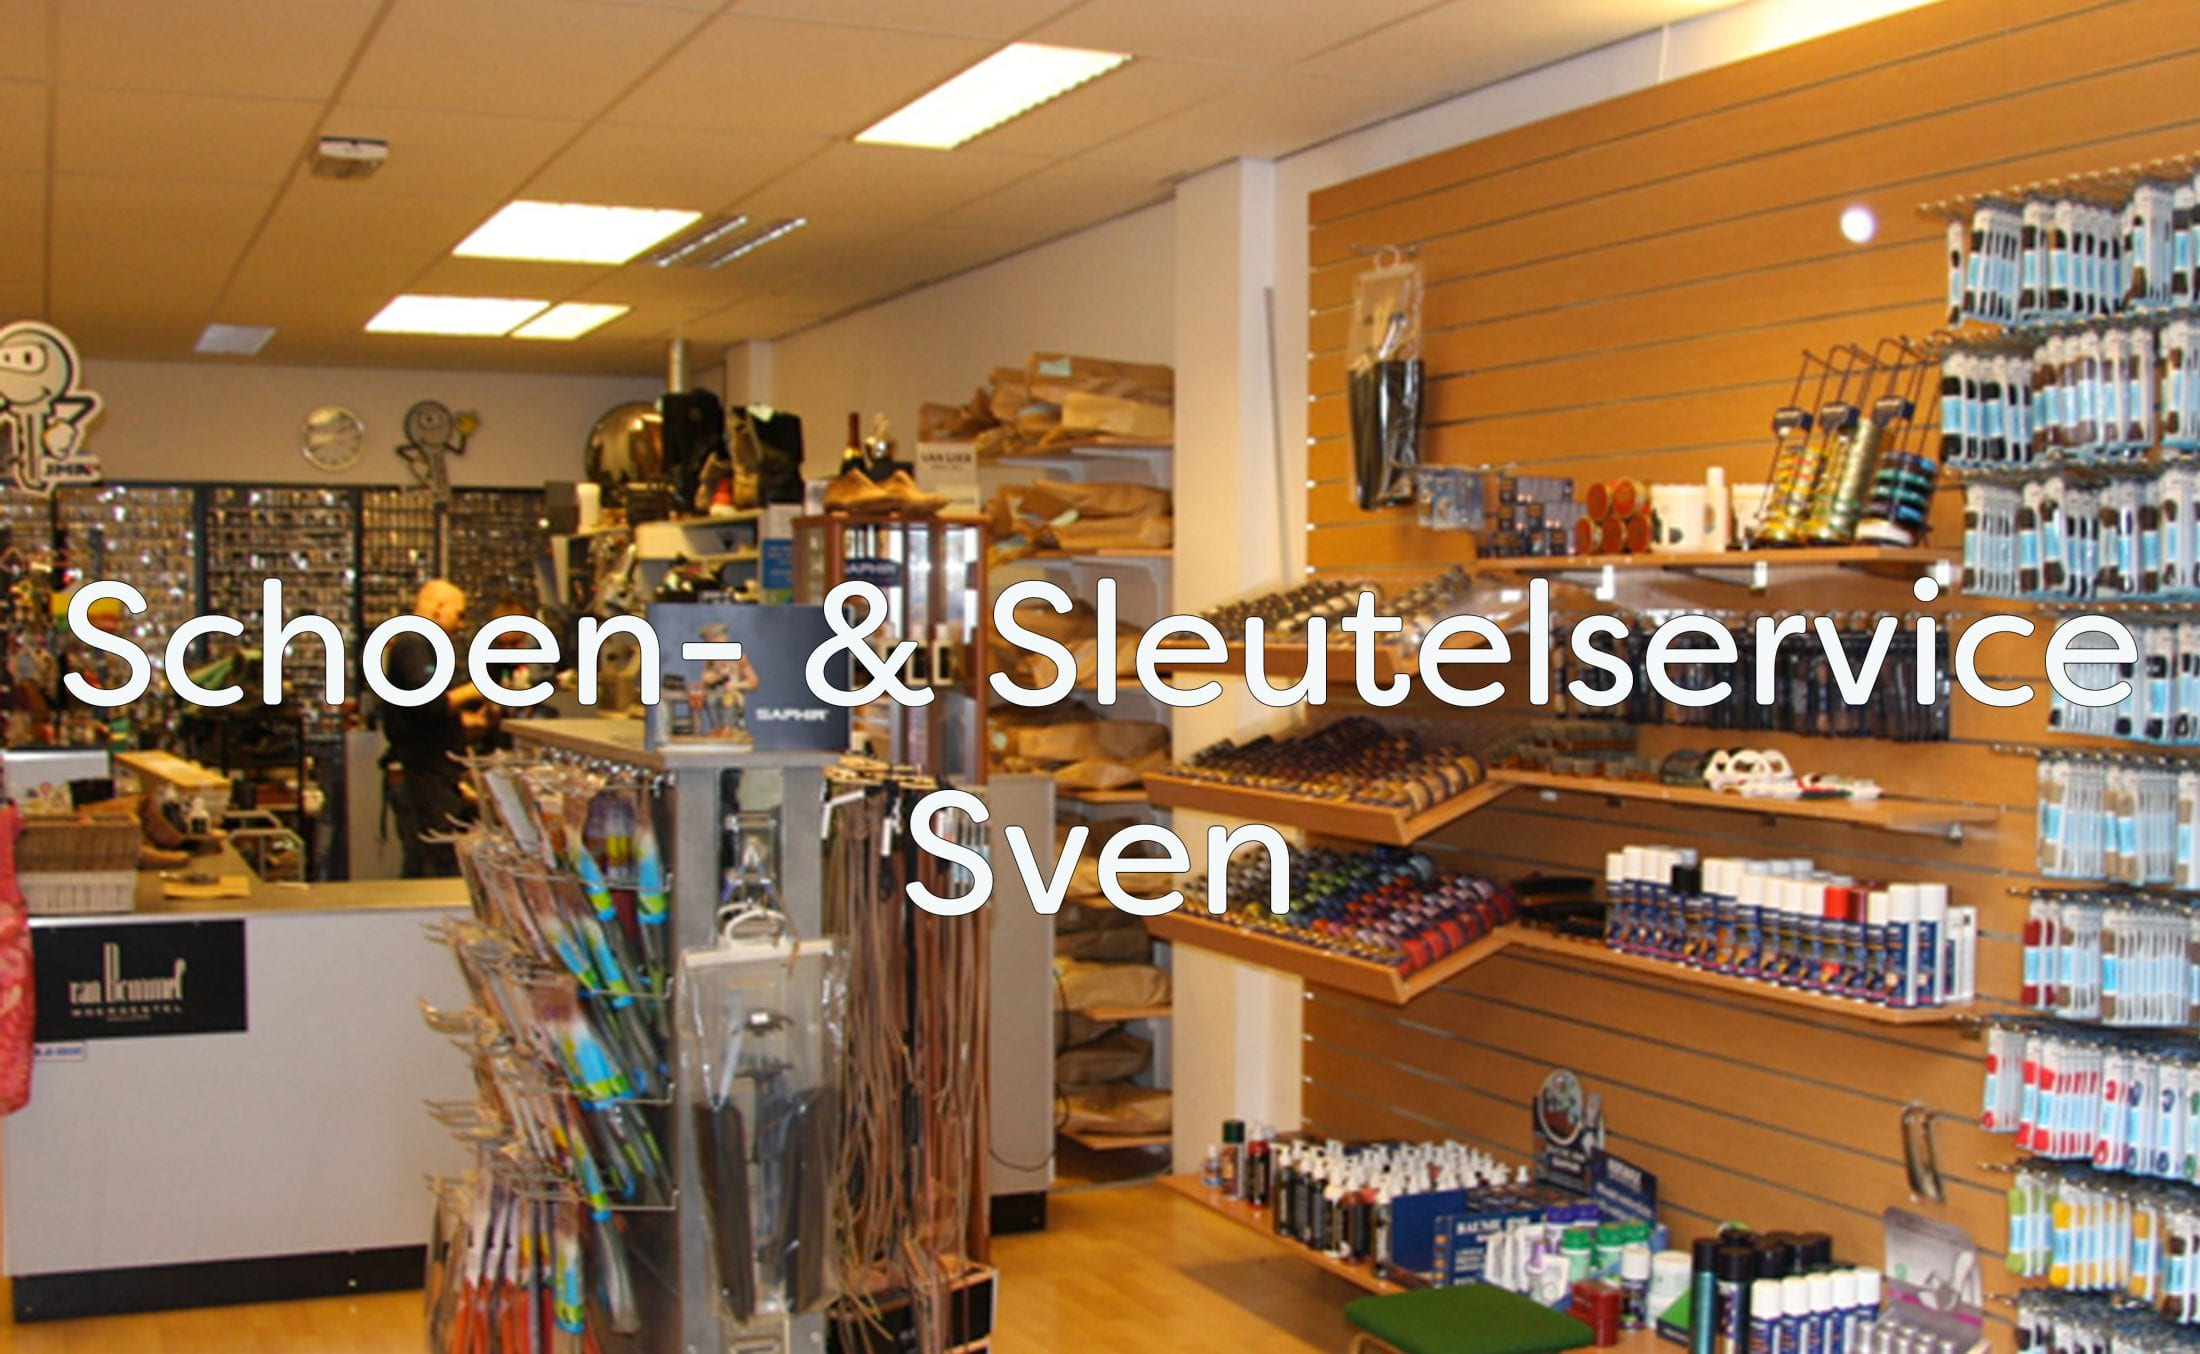 Schoen- & Sleutelservice Sven